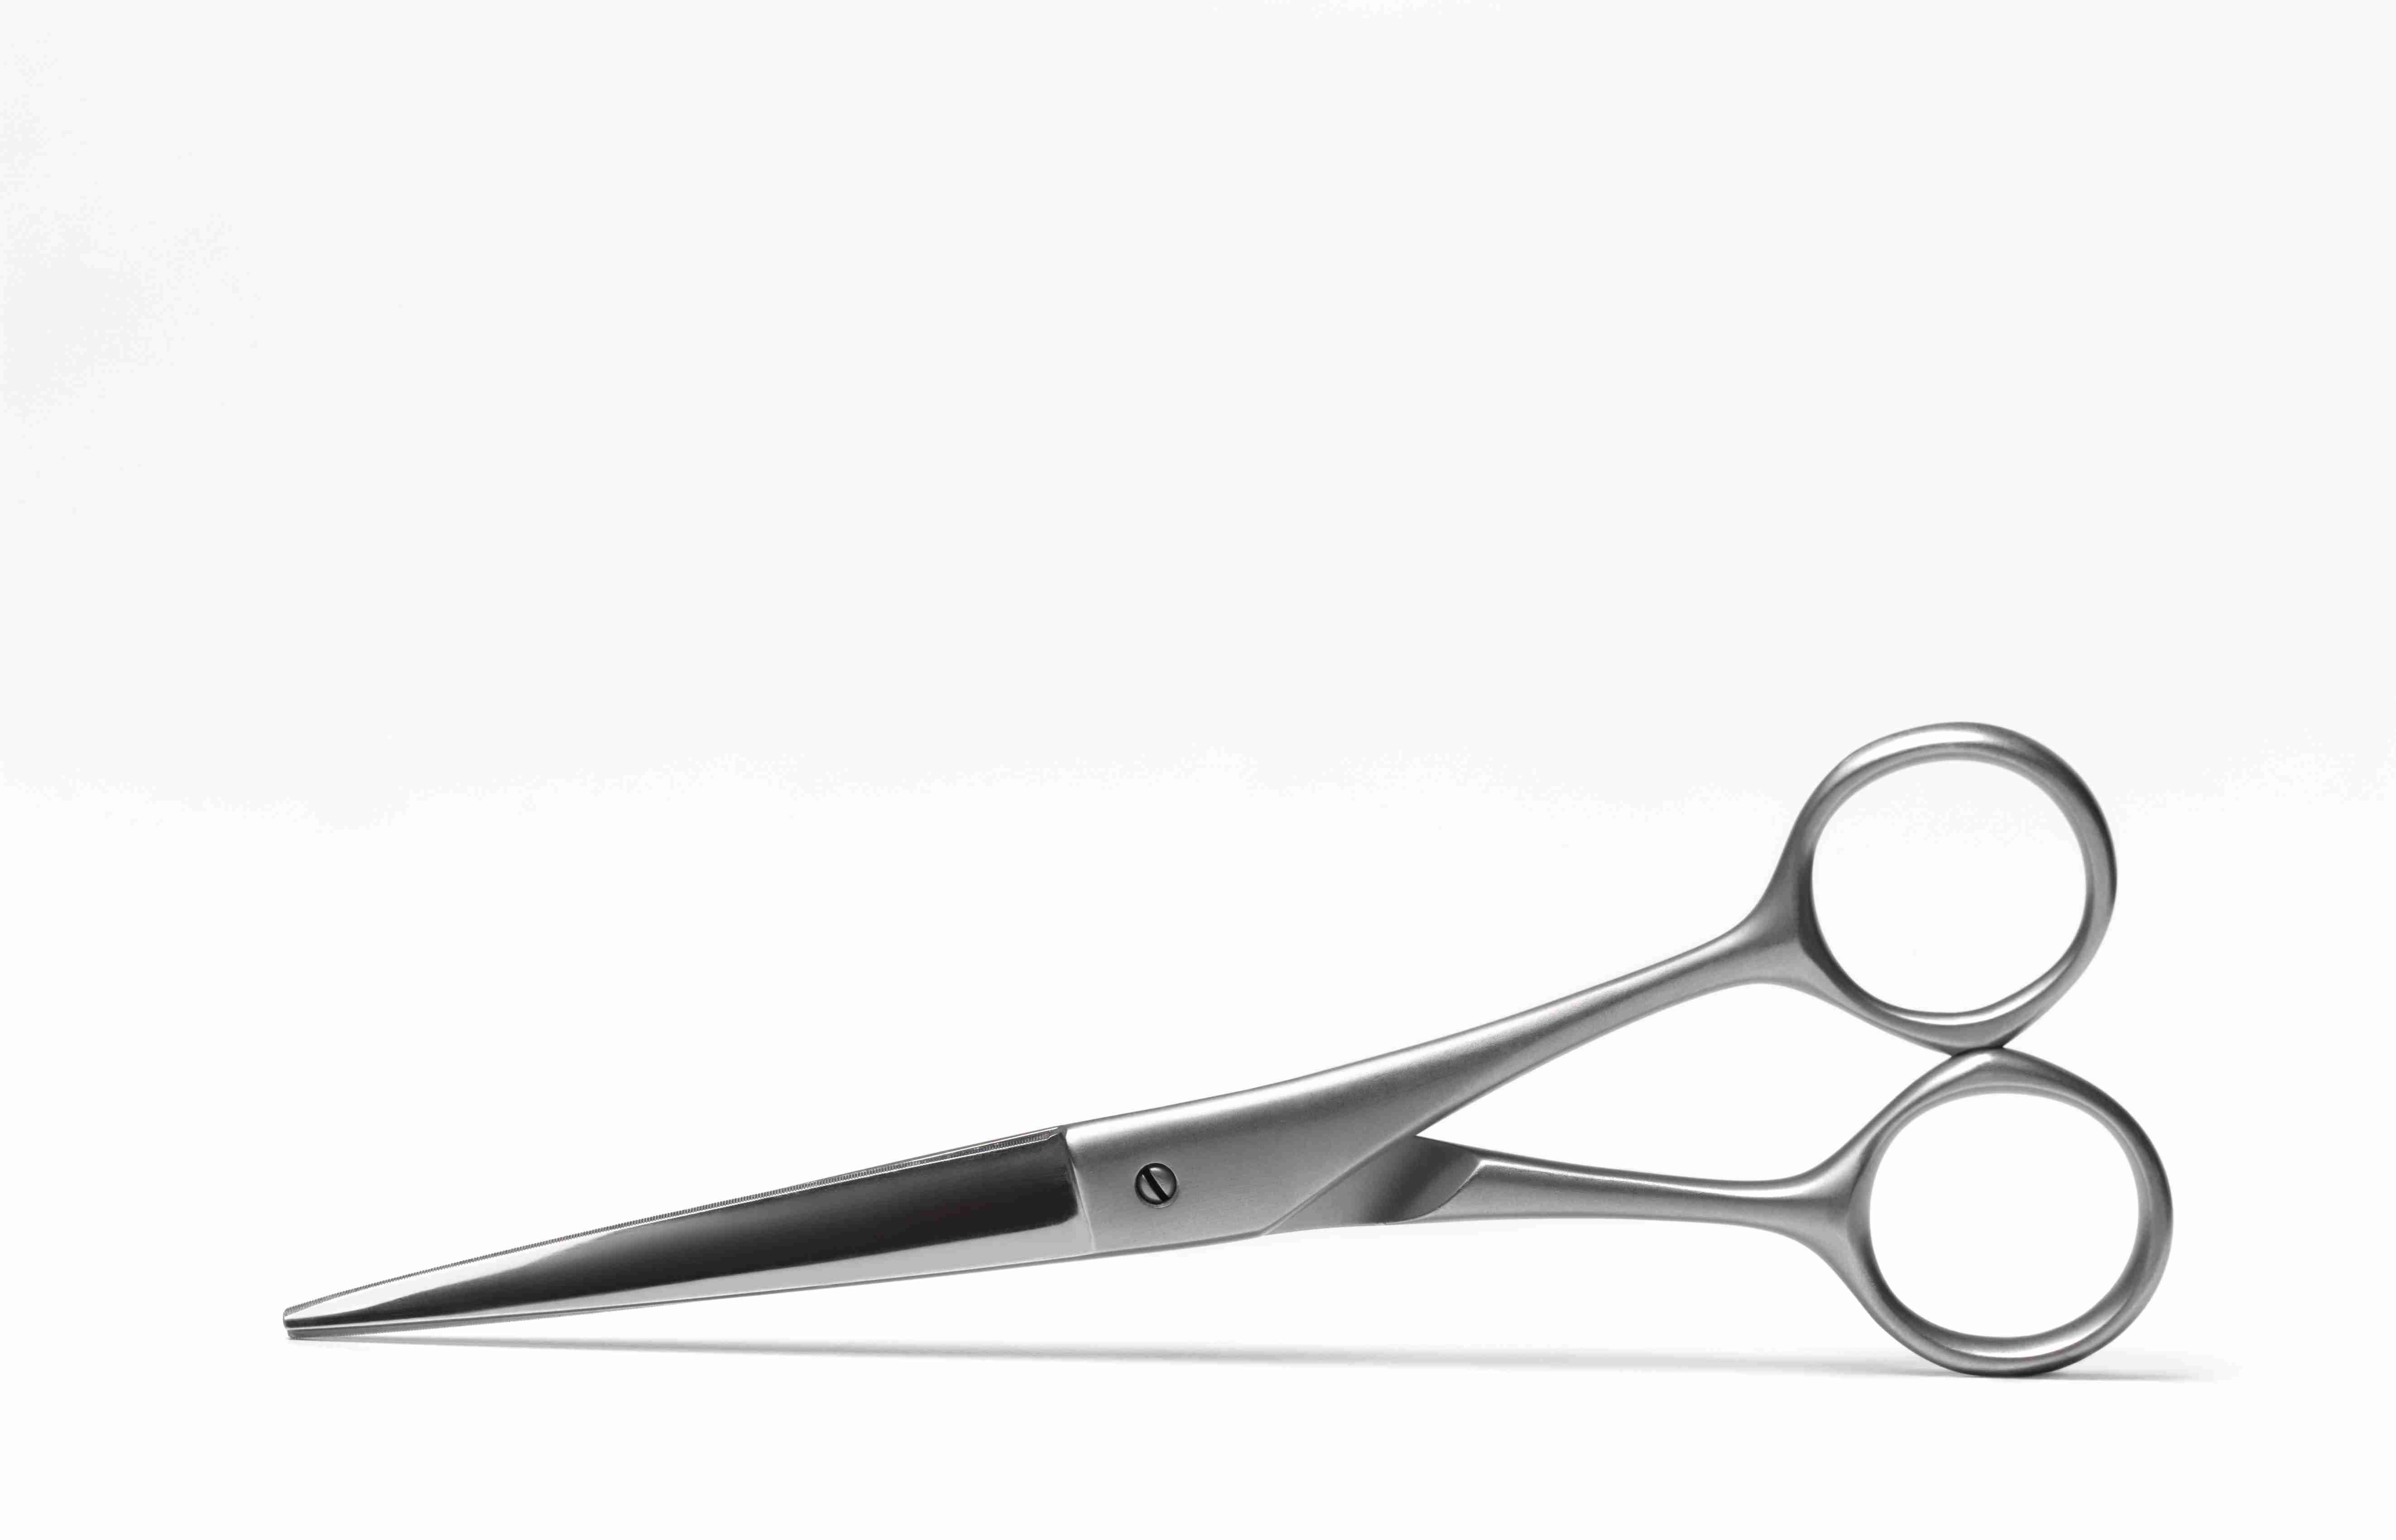 Scissors on white background